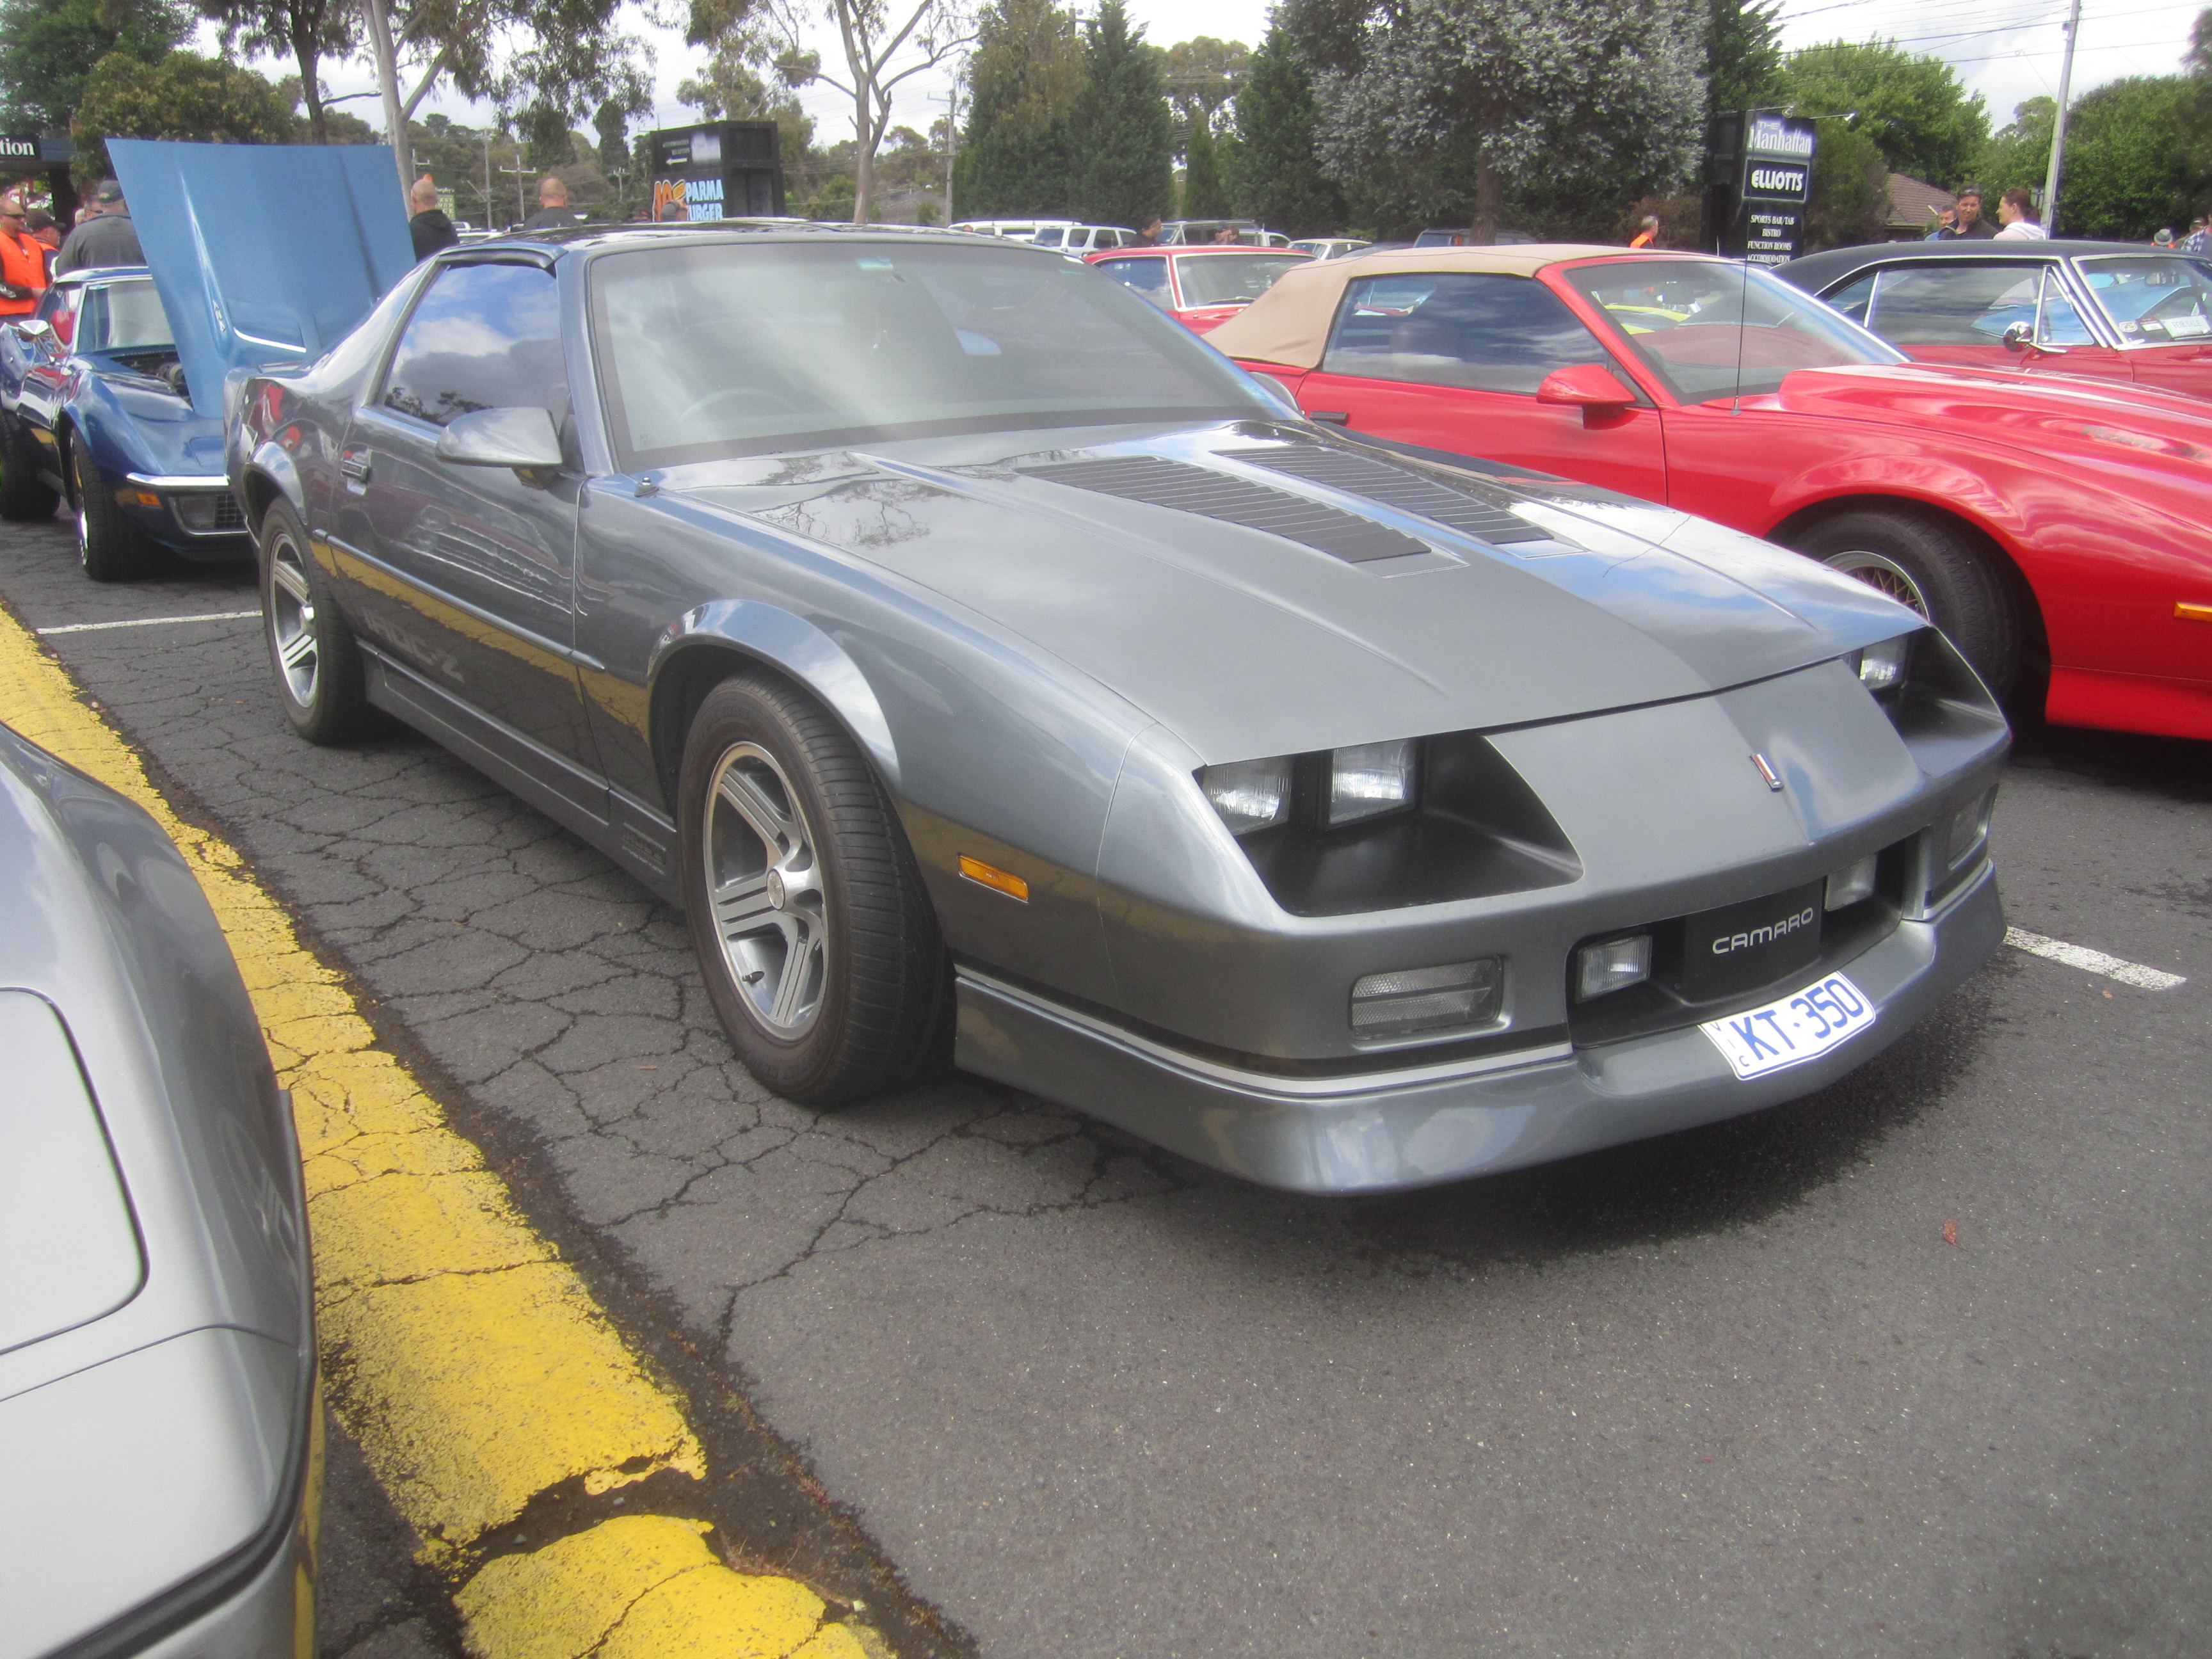 Iroc Z Wiki >> File:1988 Chevrolet Camaro IROC-Z.jpg - Wikimedia Commons